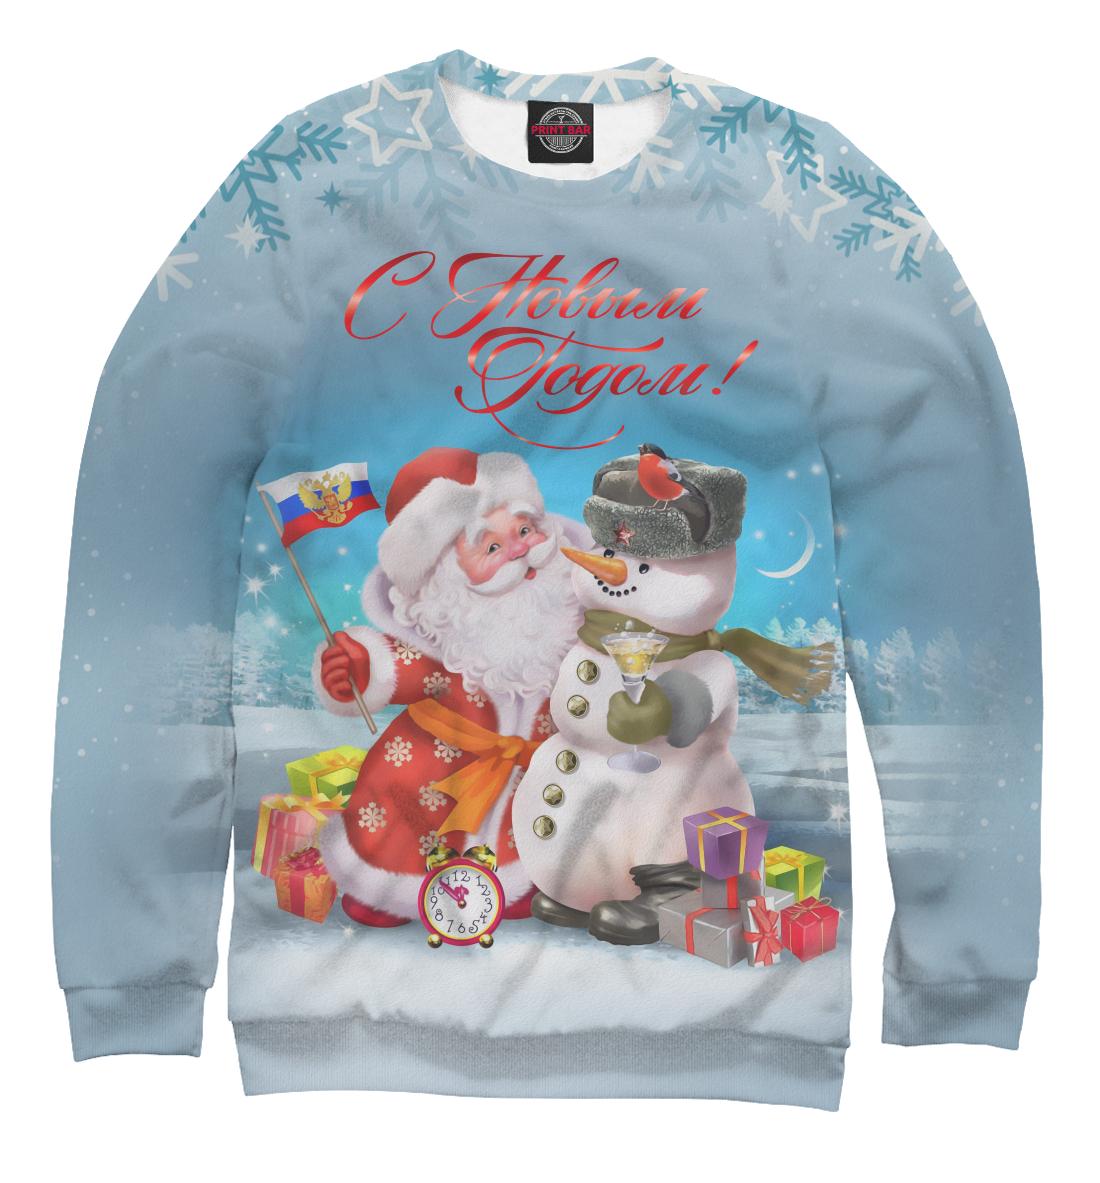 Купить Дед Мороз, Printbar, Свитшоты, NOV-960372-swi-2